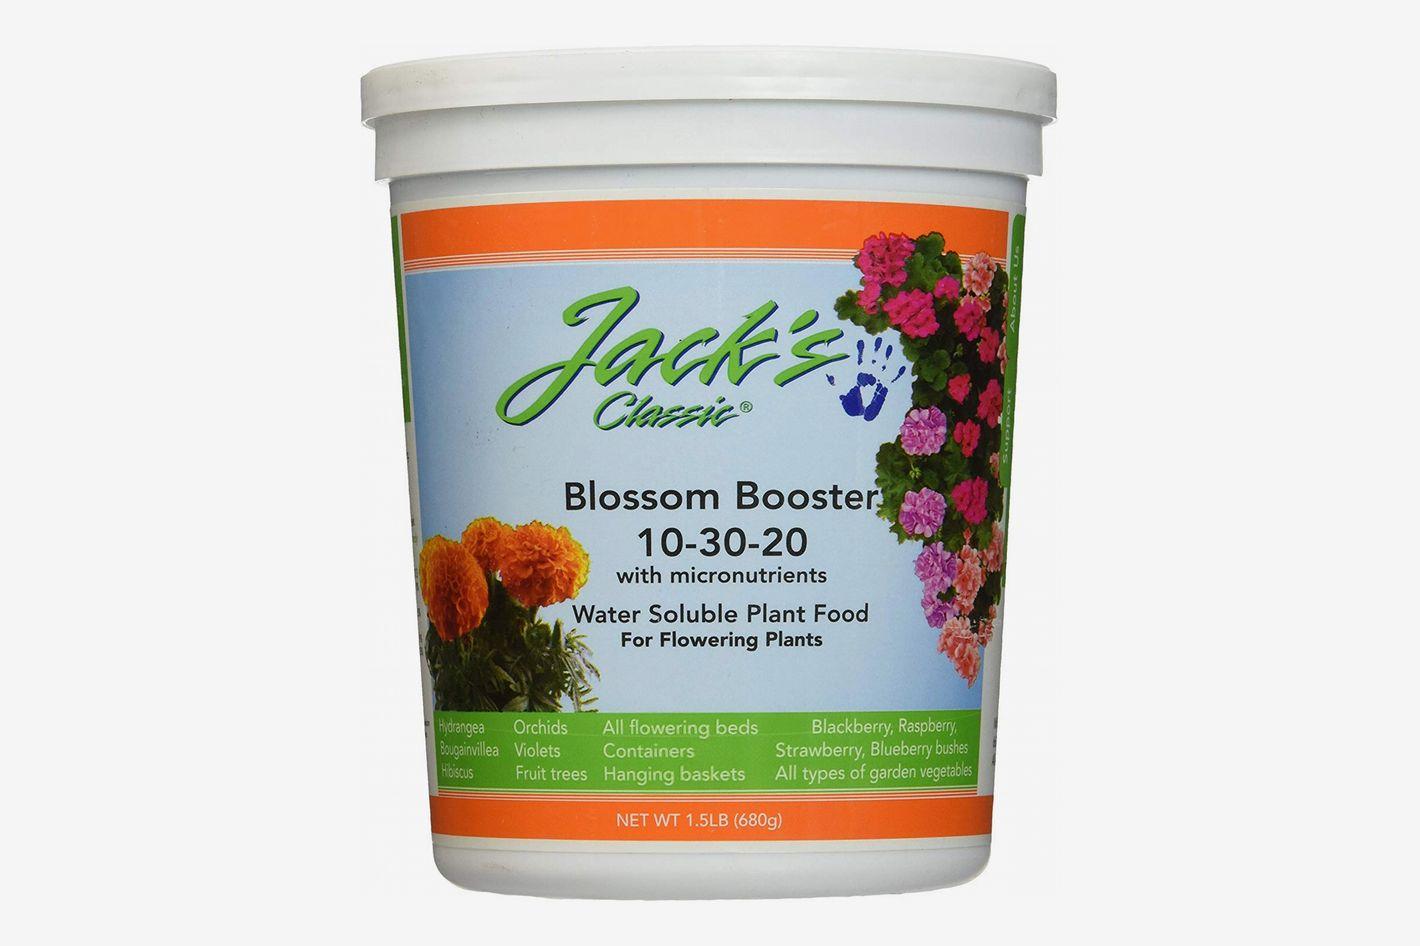 Jack's Classic Blossom Booster Fertilizer 10-30-20